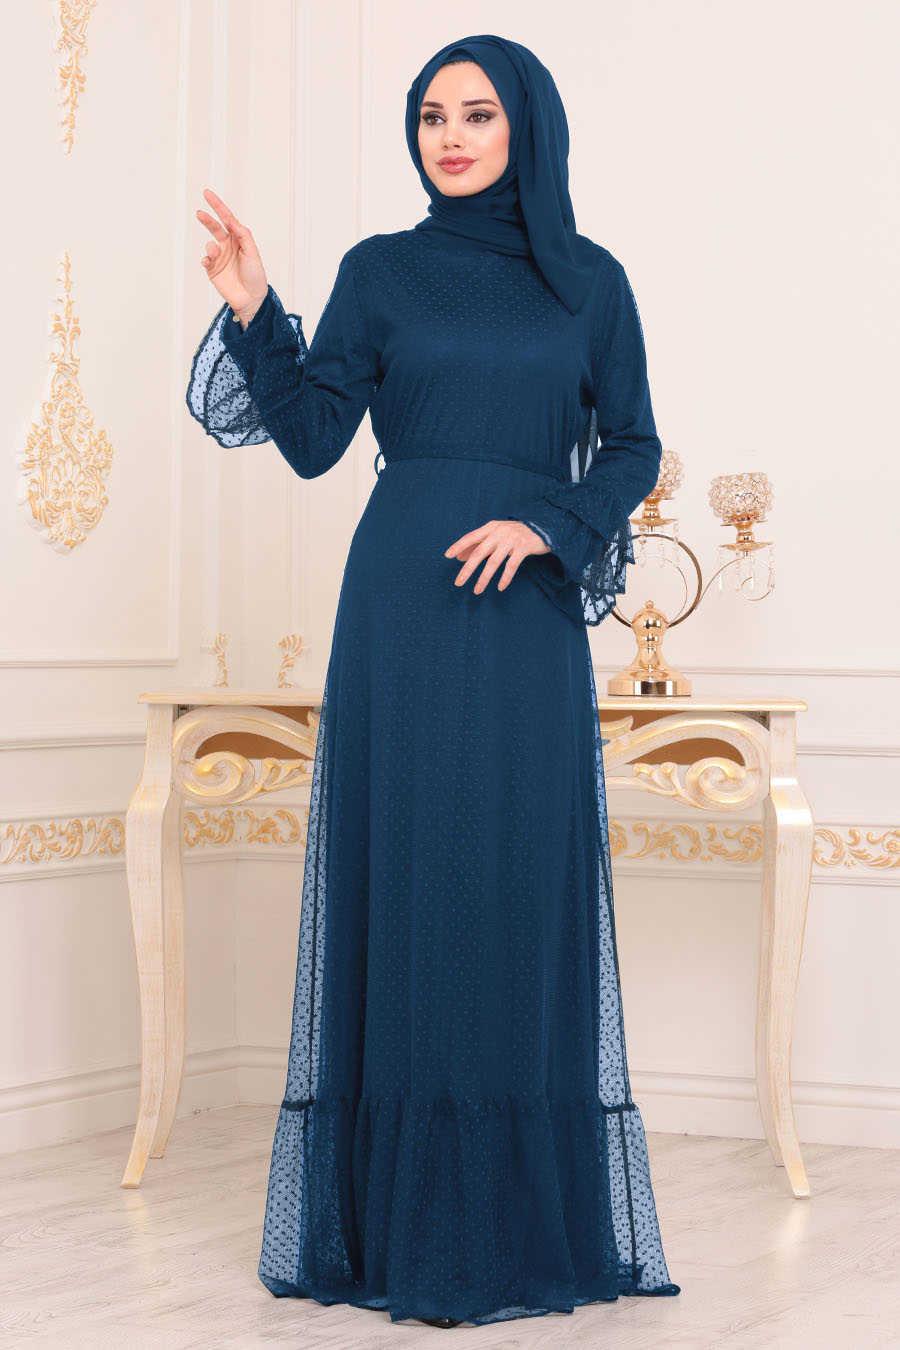 Neva Style - Indigo Blue Hijab Dress 42721IM